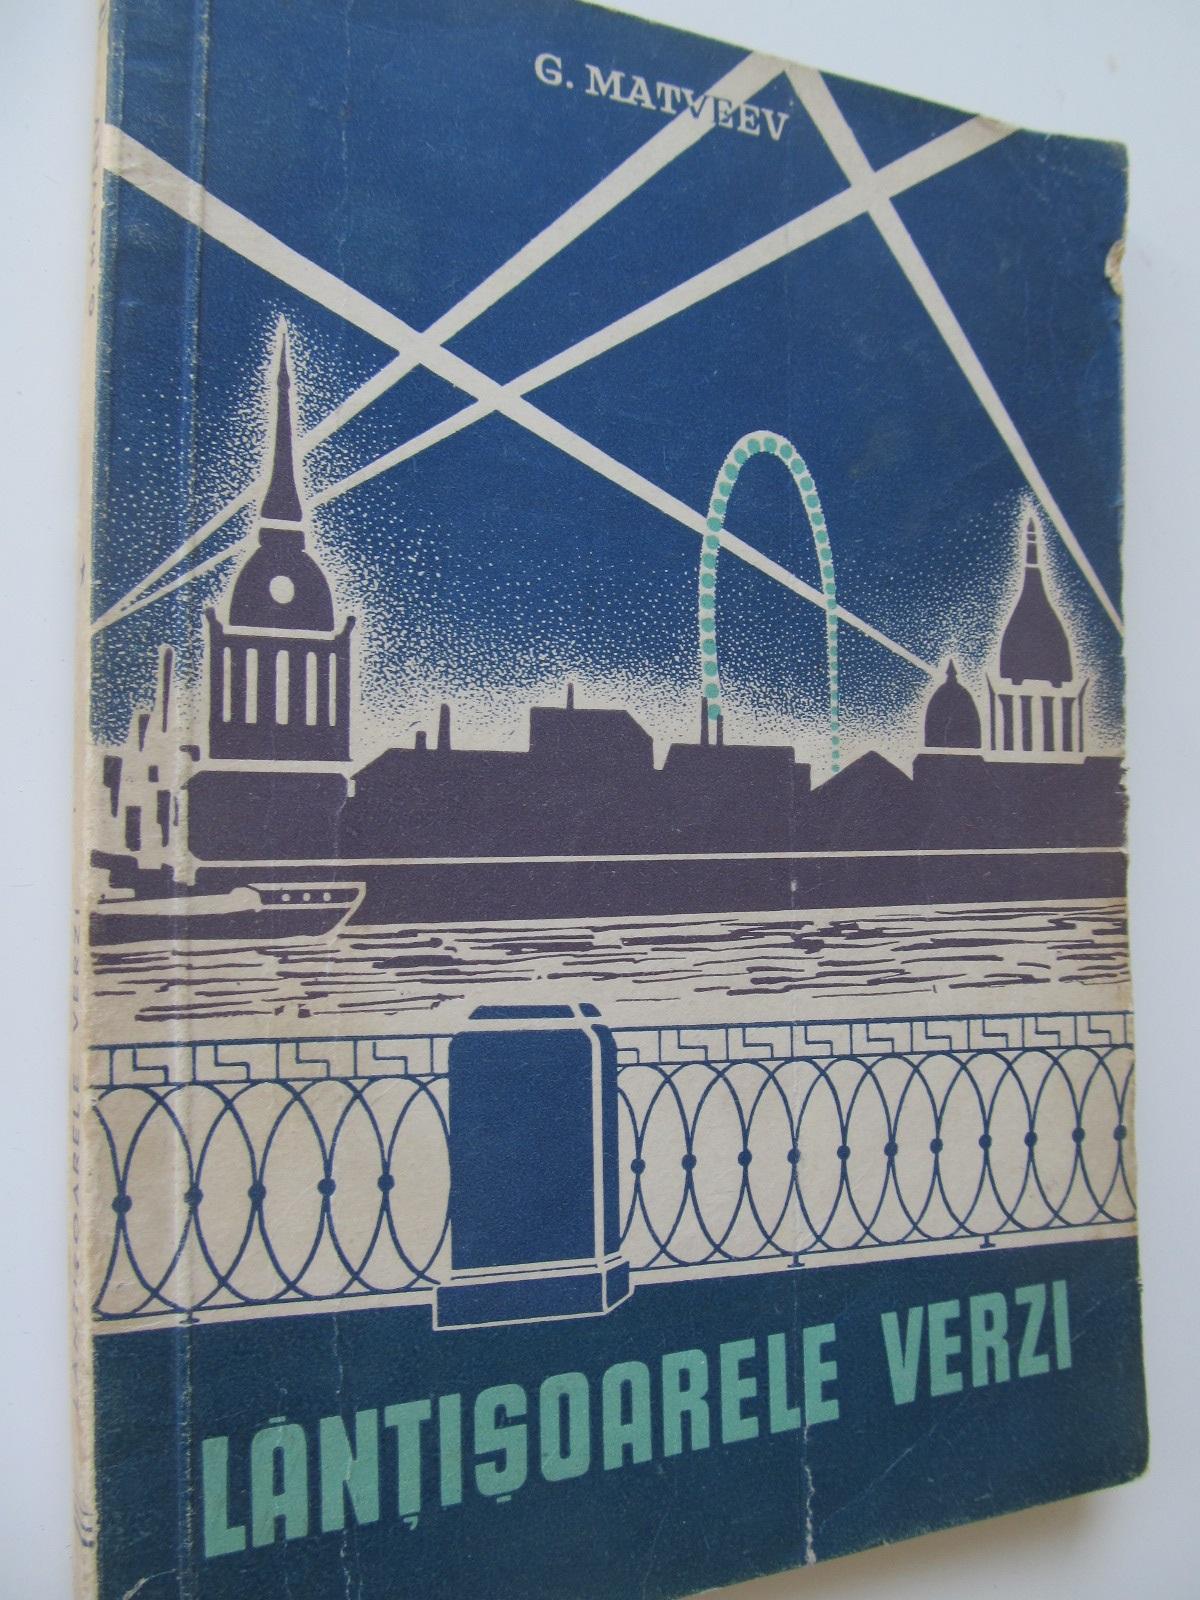 Lantisoarele verzi - G. Matveev | Detalii carte